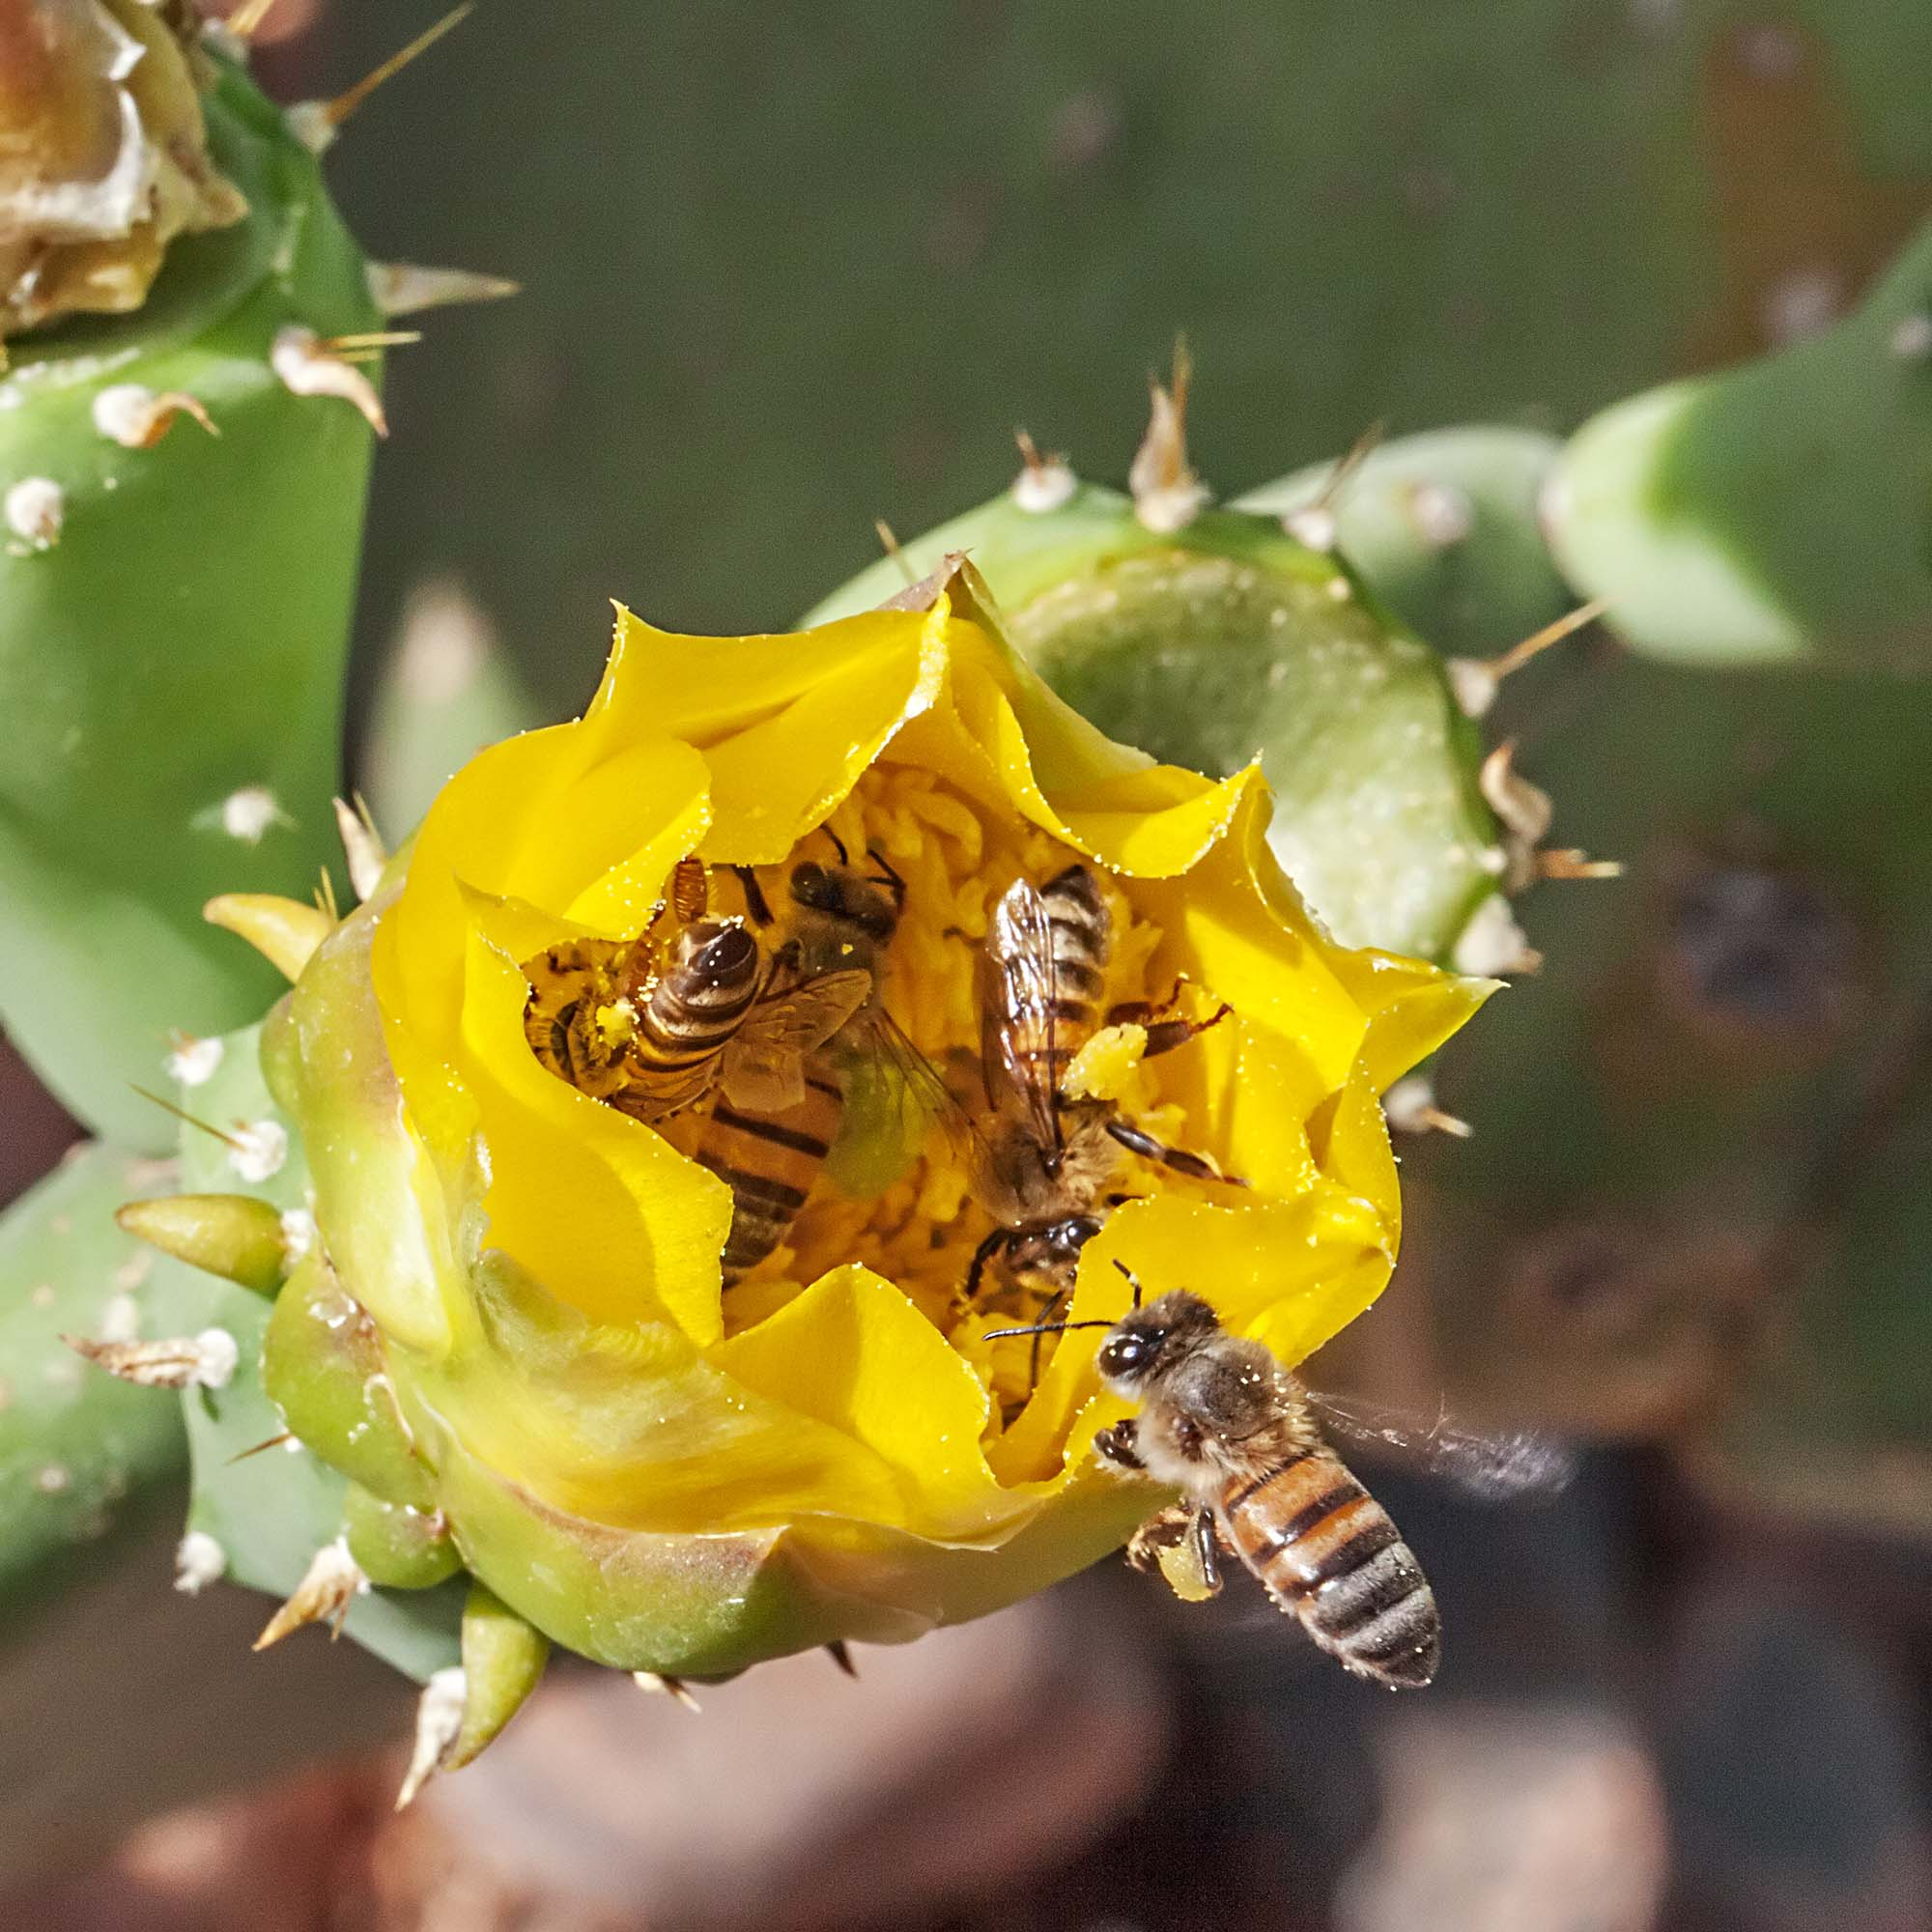 Bee Madang Ples Bilong Mi